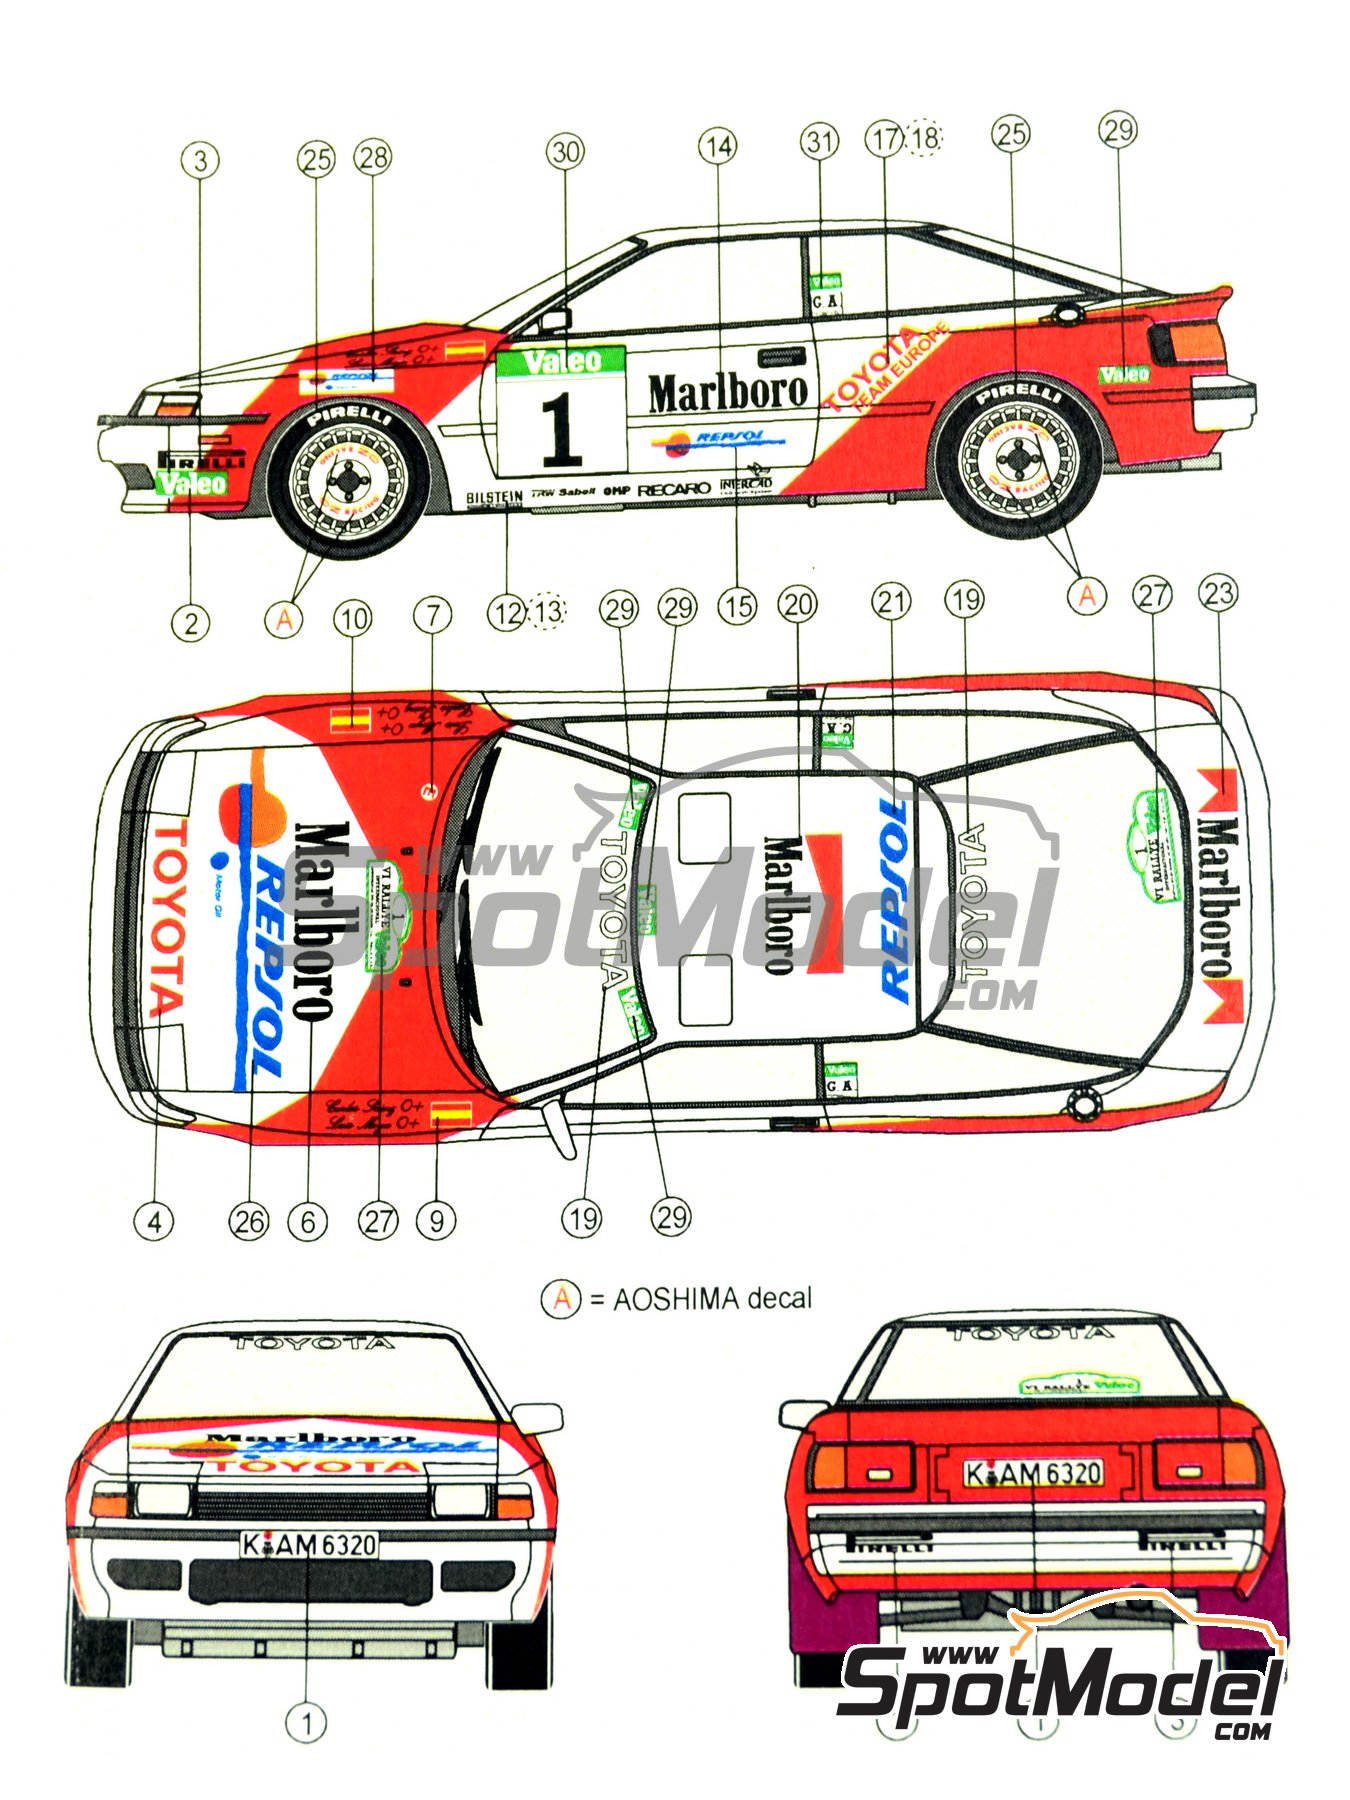 Toyota Celica GT-Four ST165 Marlboro - El Corte Ingles Rally , Valeo Rally 1989 | Marking / livery in 1/24 scale manufactured by Reji Model (ref.REJI-185) image